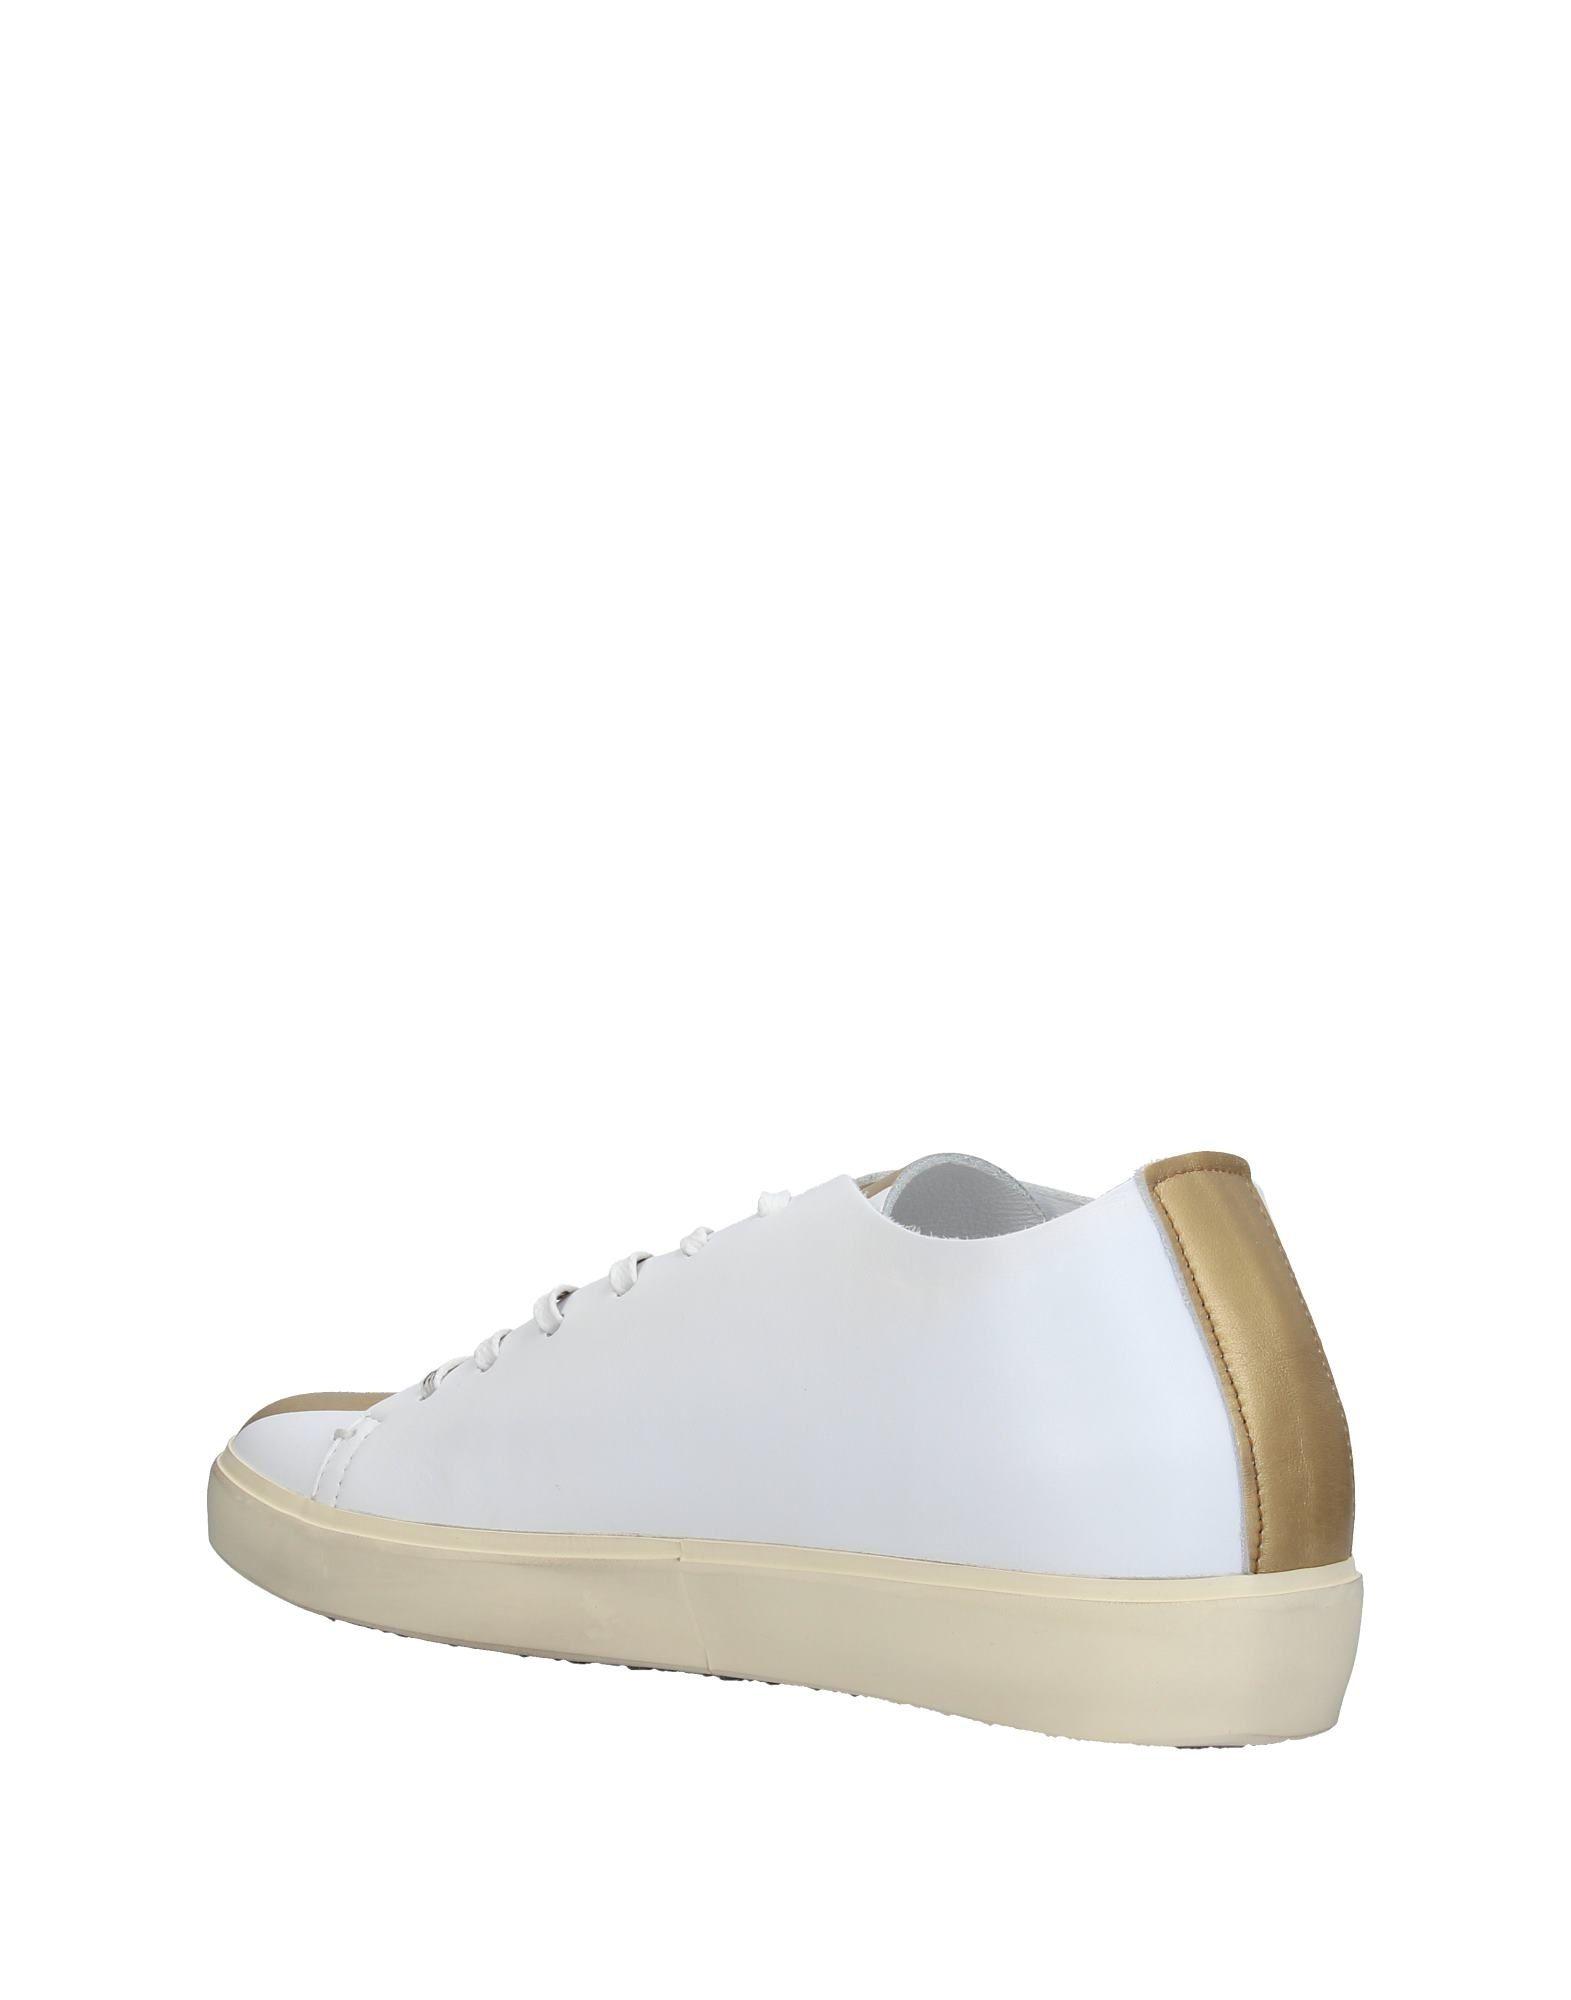 Leather Damen Crown Sneakers Damen Leather  11380699IJ Gute Qualität beliebte Schuhe 8e8cde